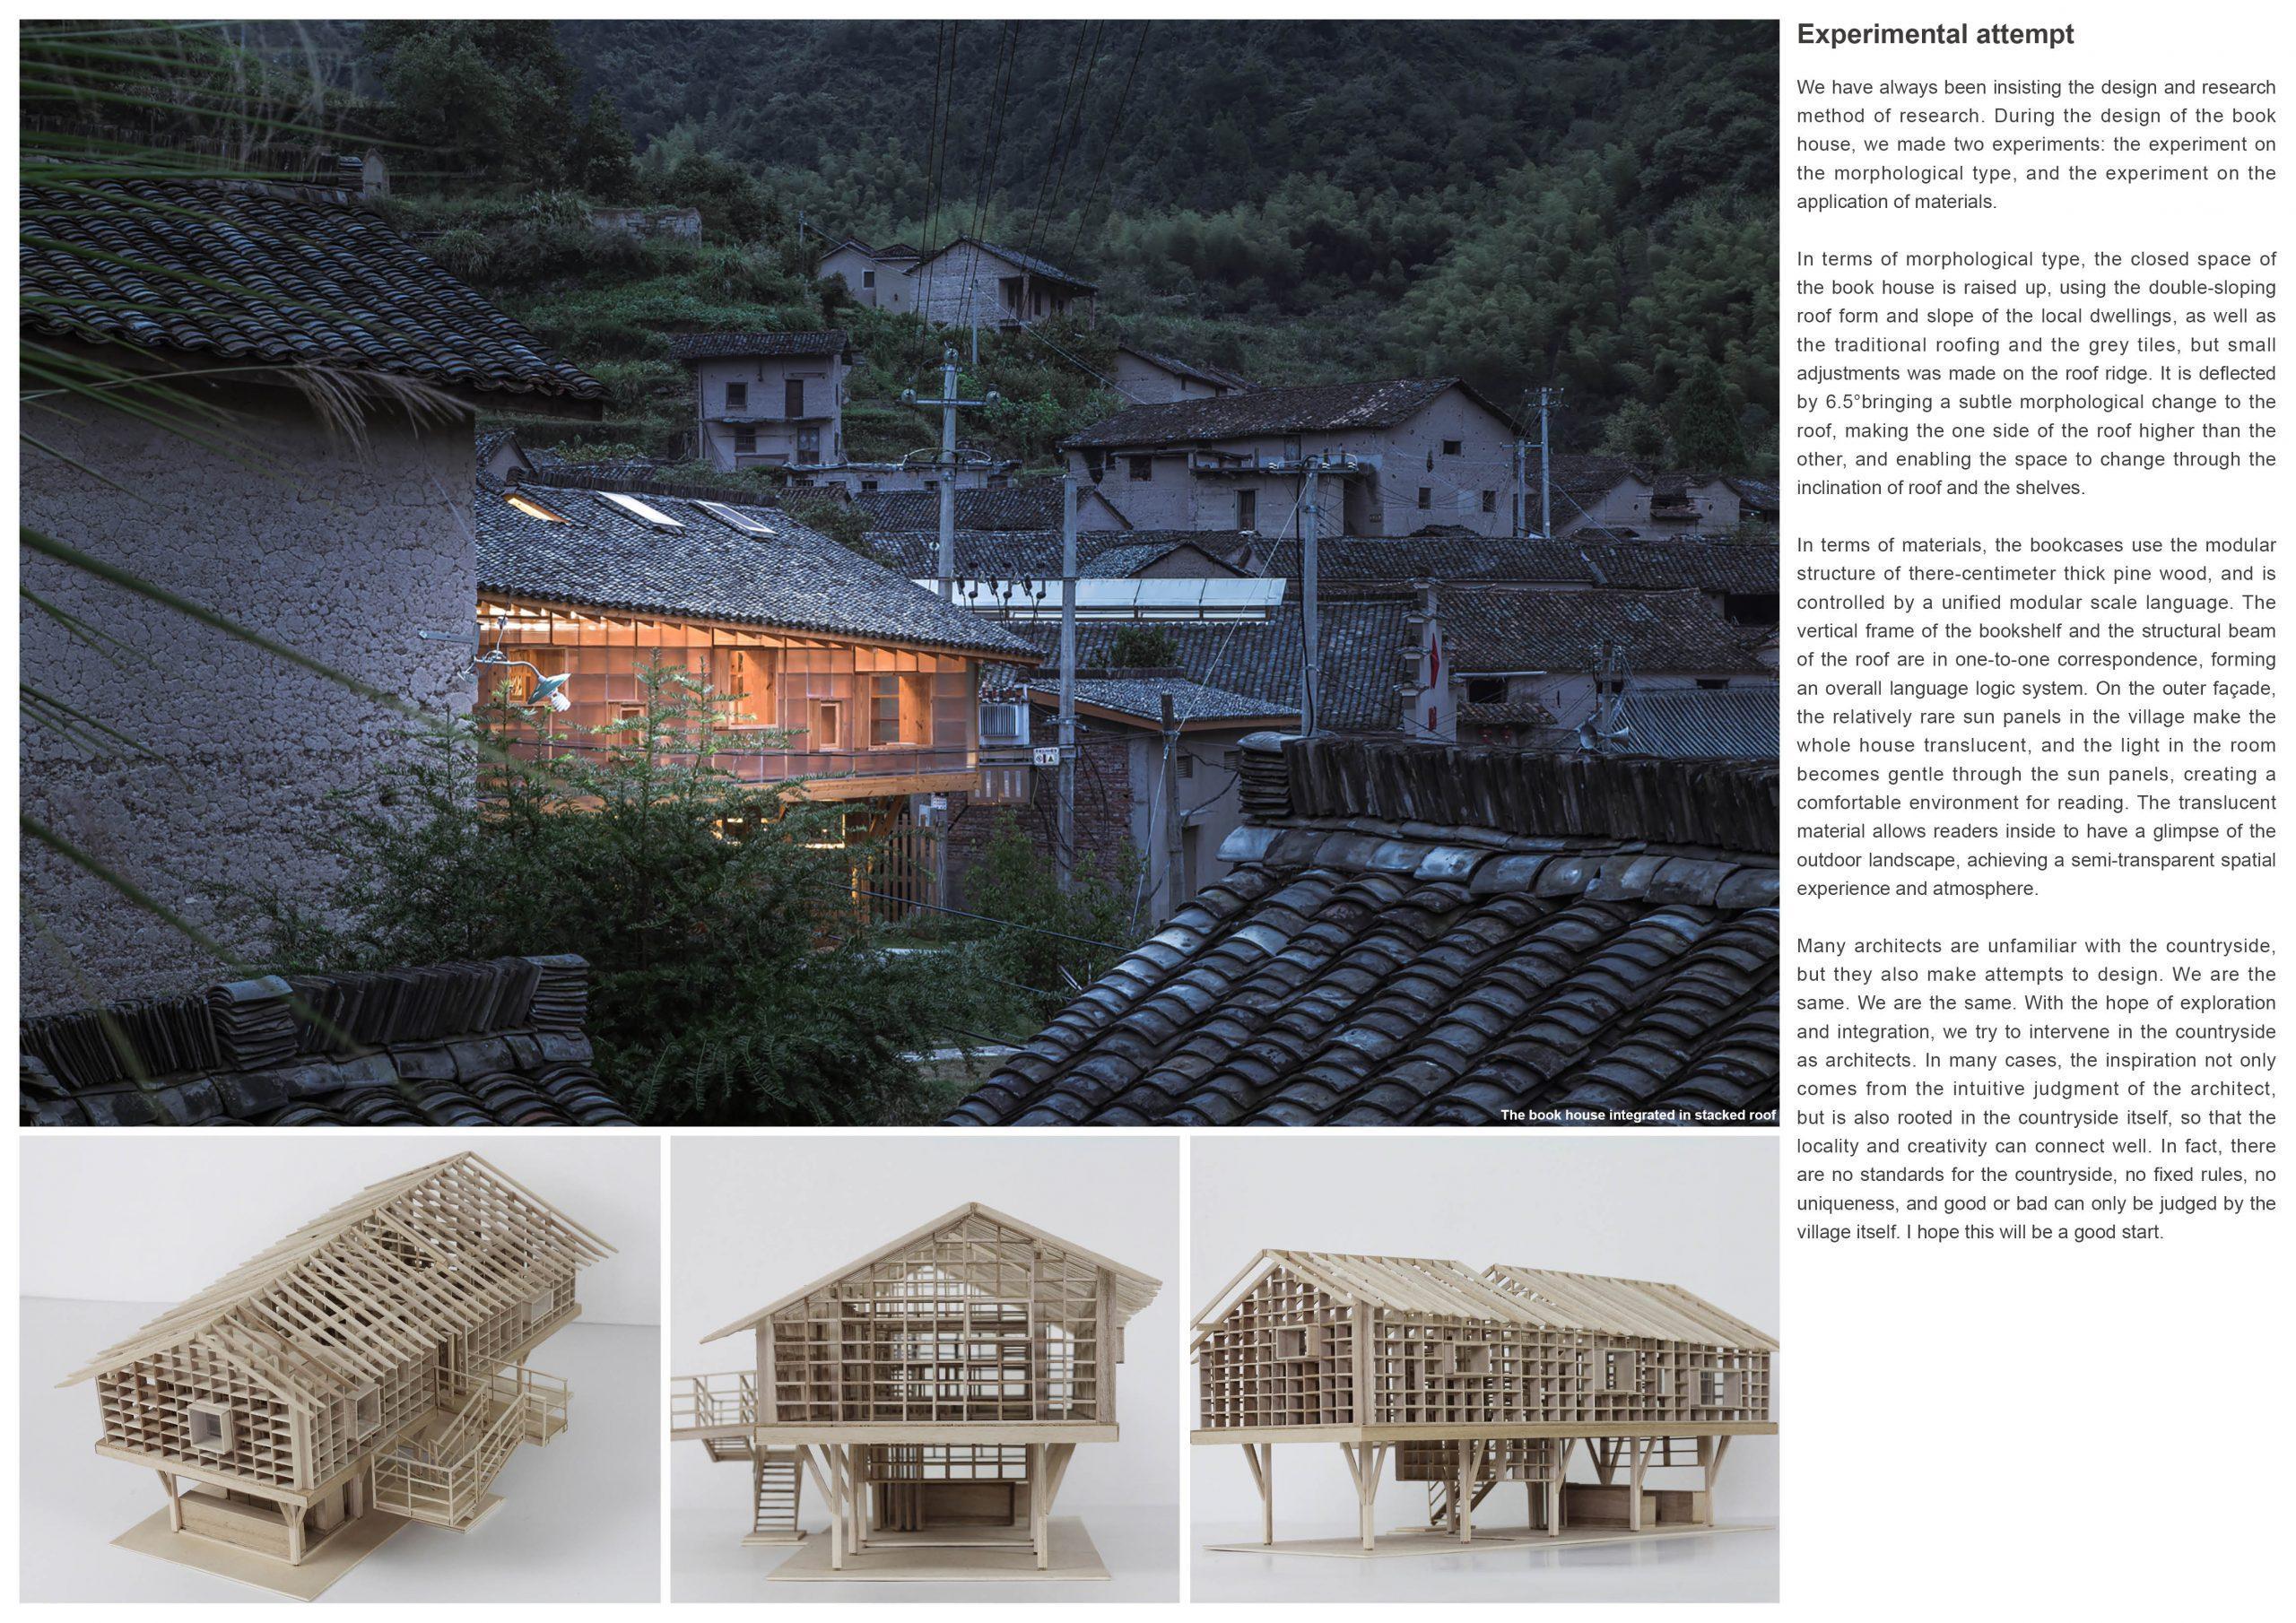 Silver Prize In Architectural Design Book House 05